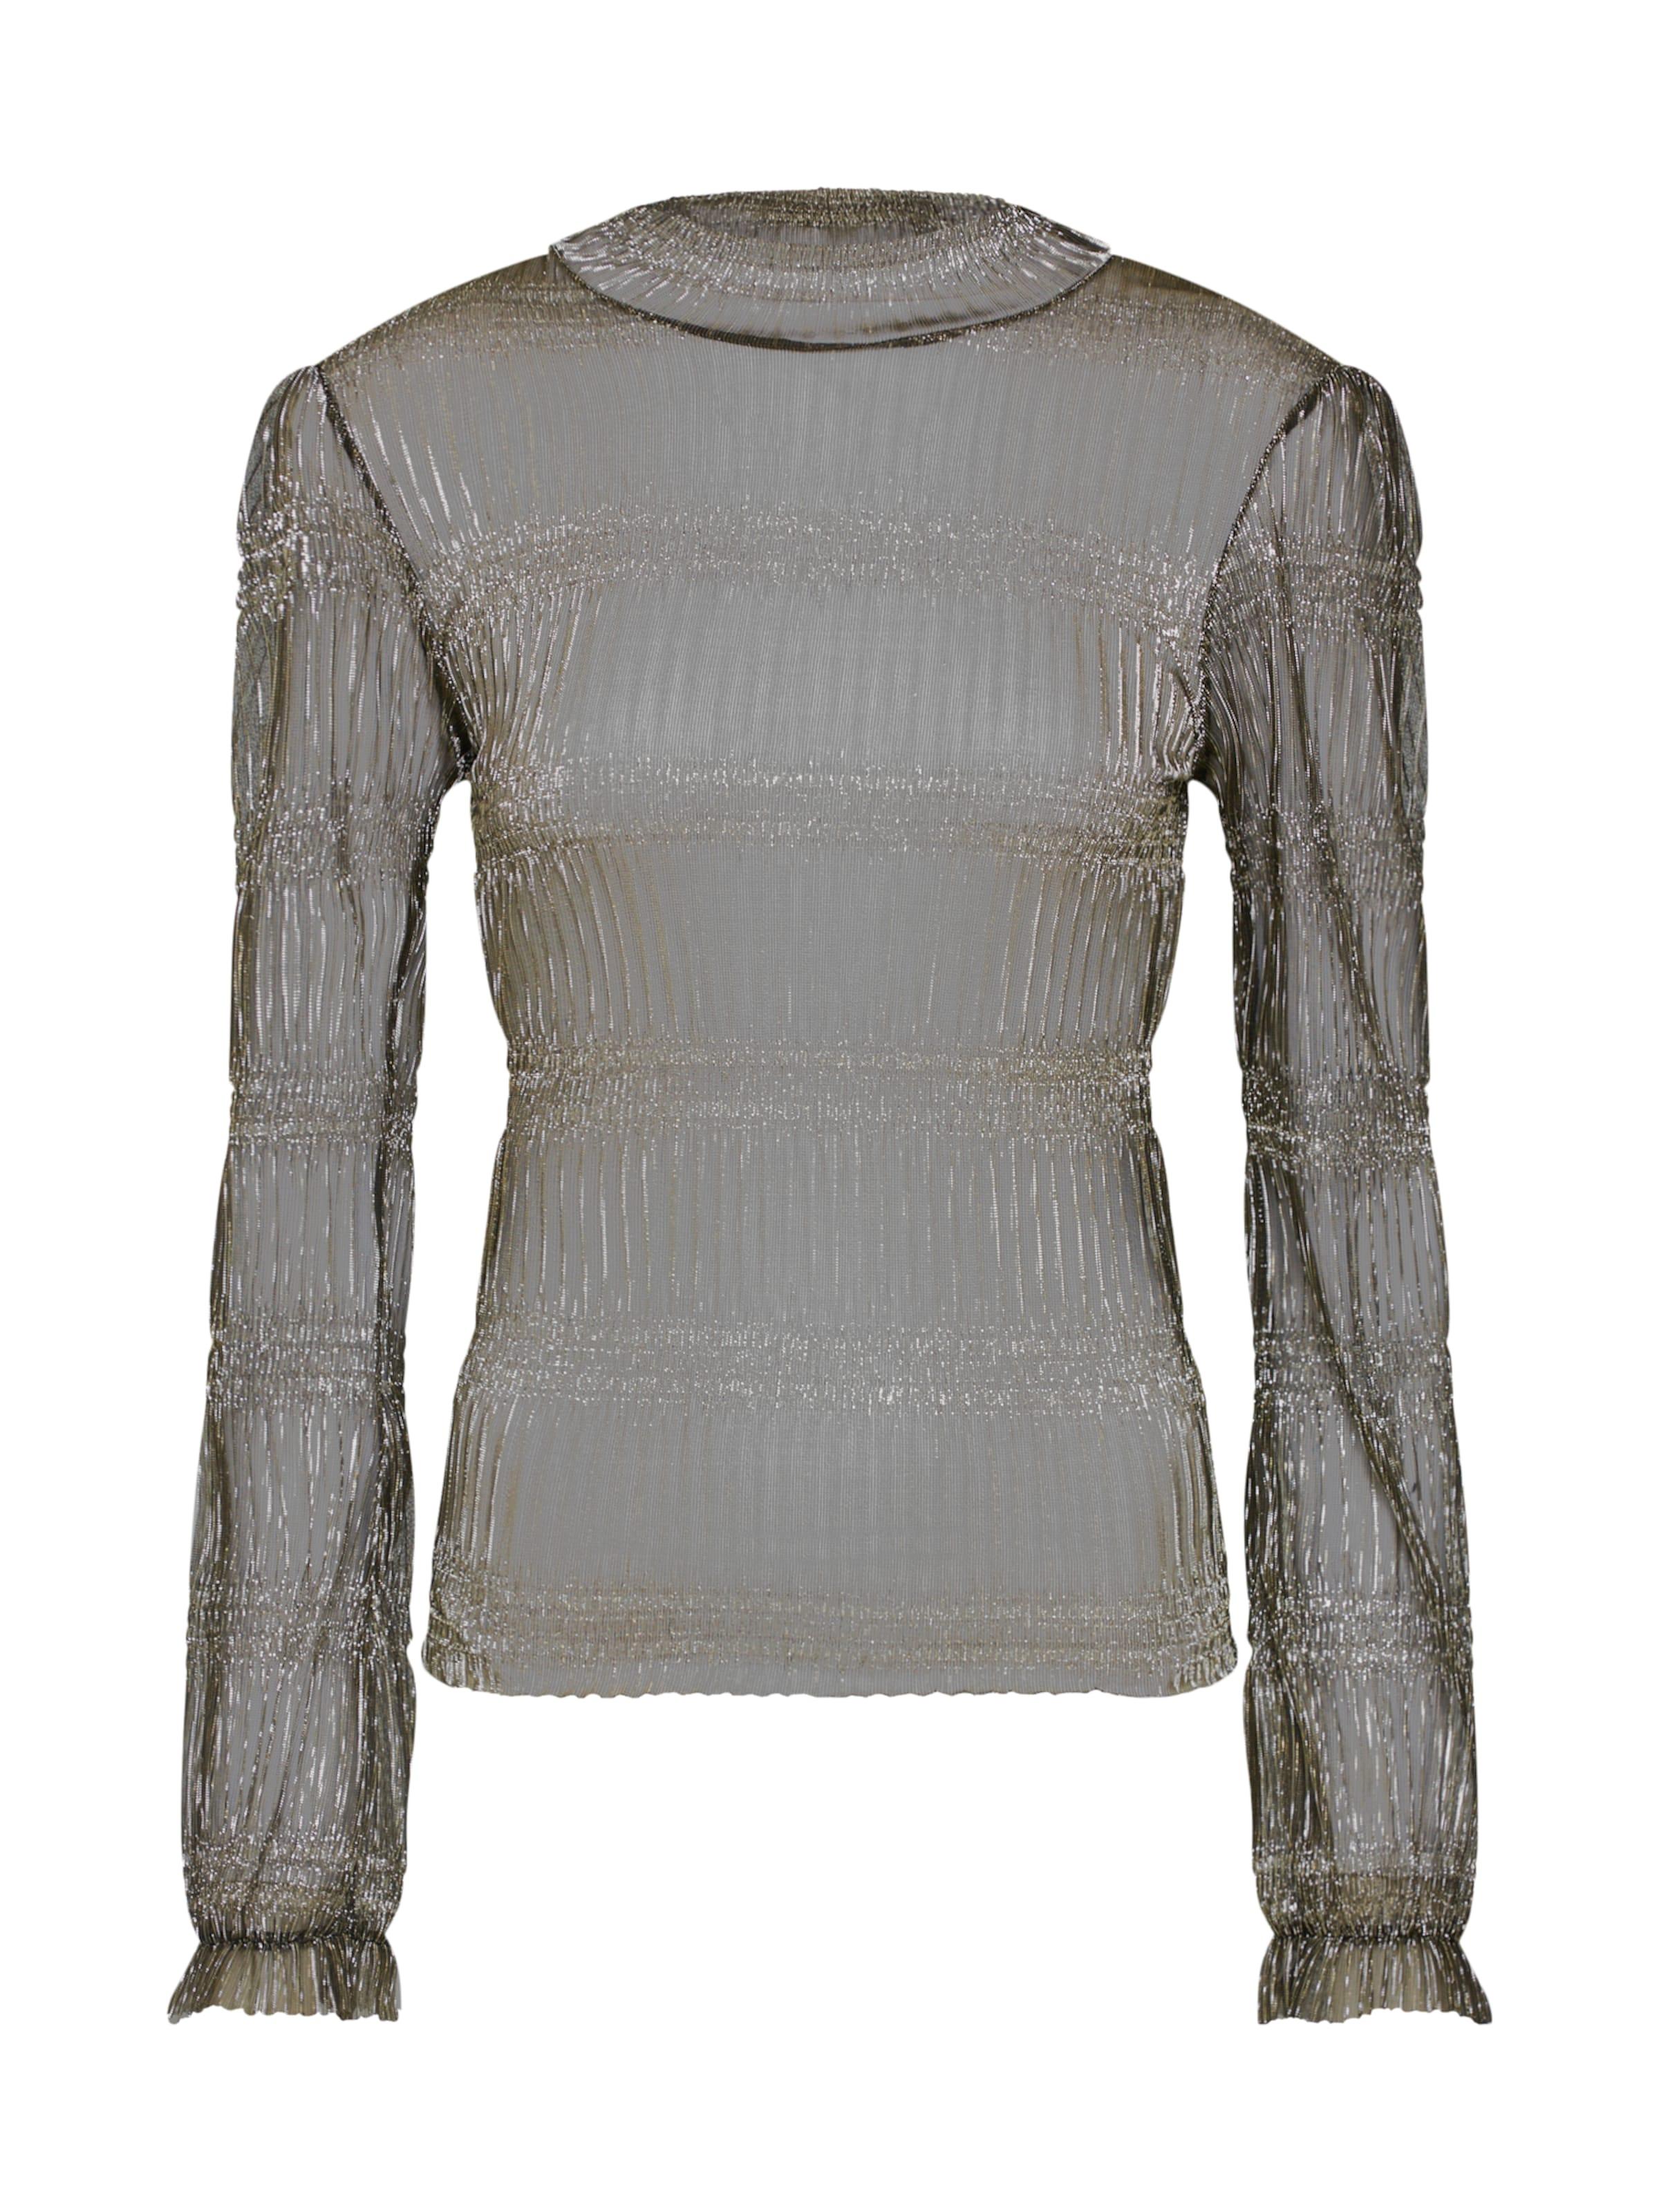 Sisters shirt En FoncéArgent Point 'simba' T Brun N8m0nw